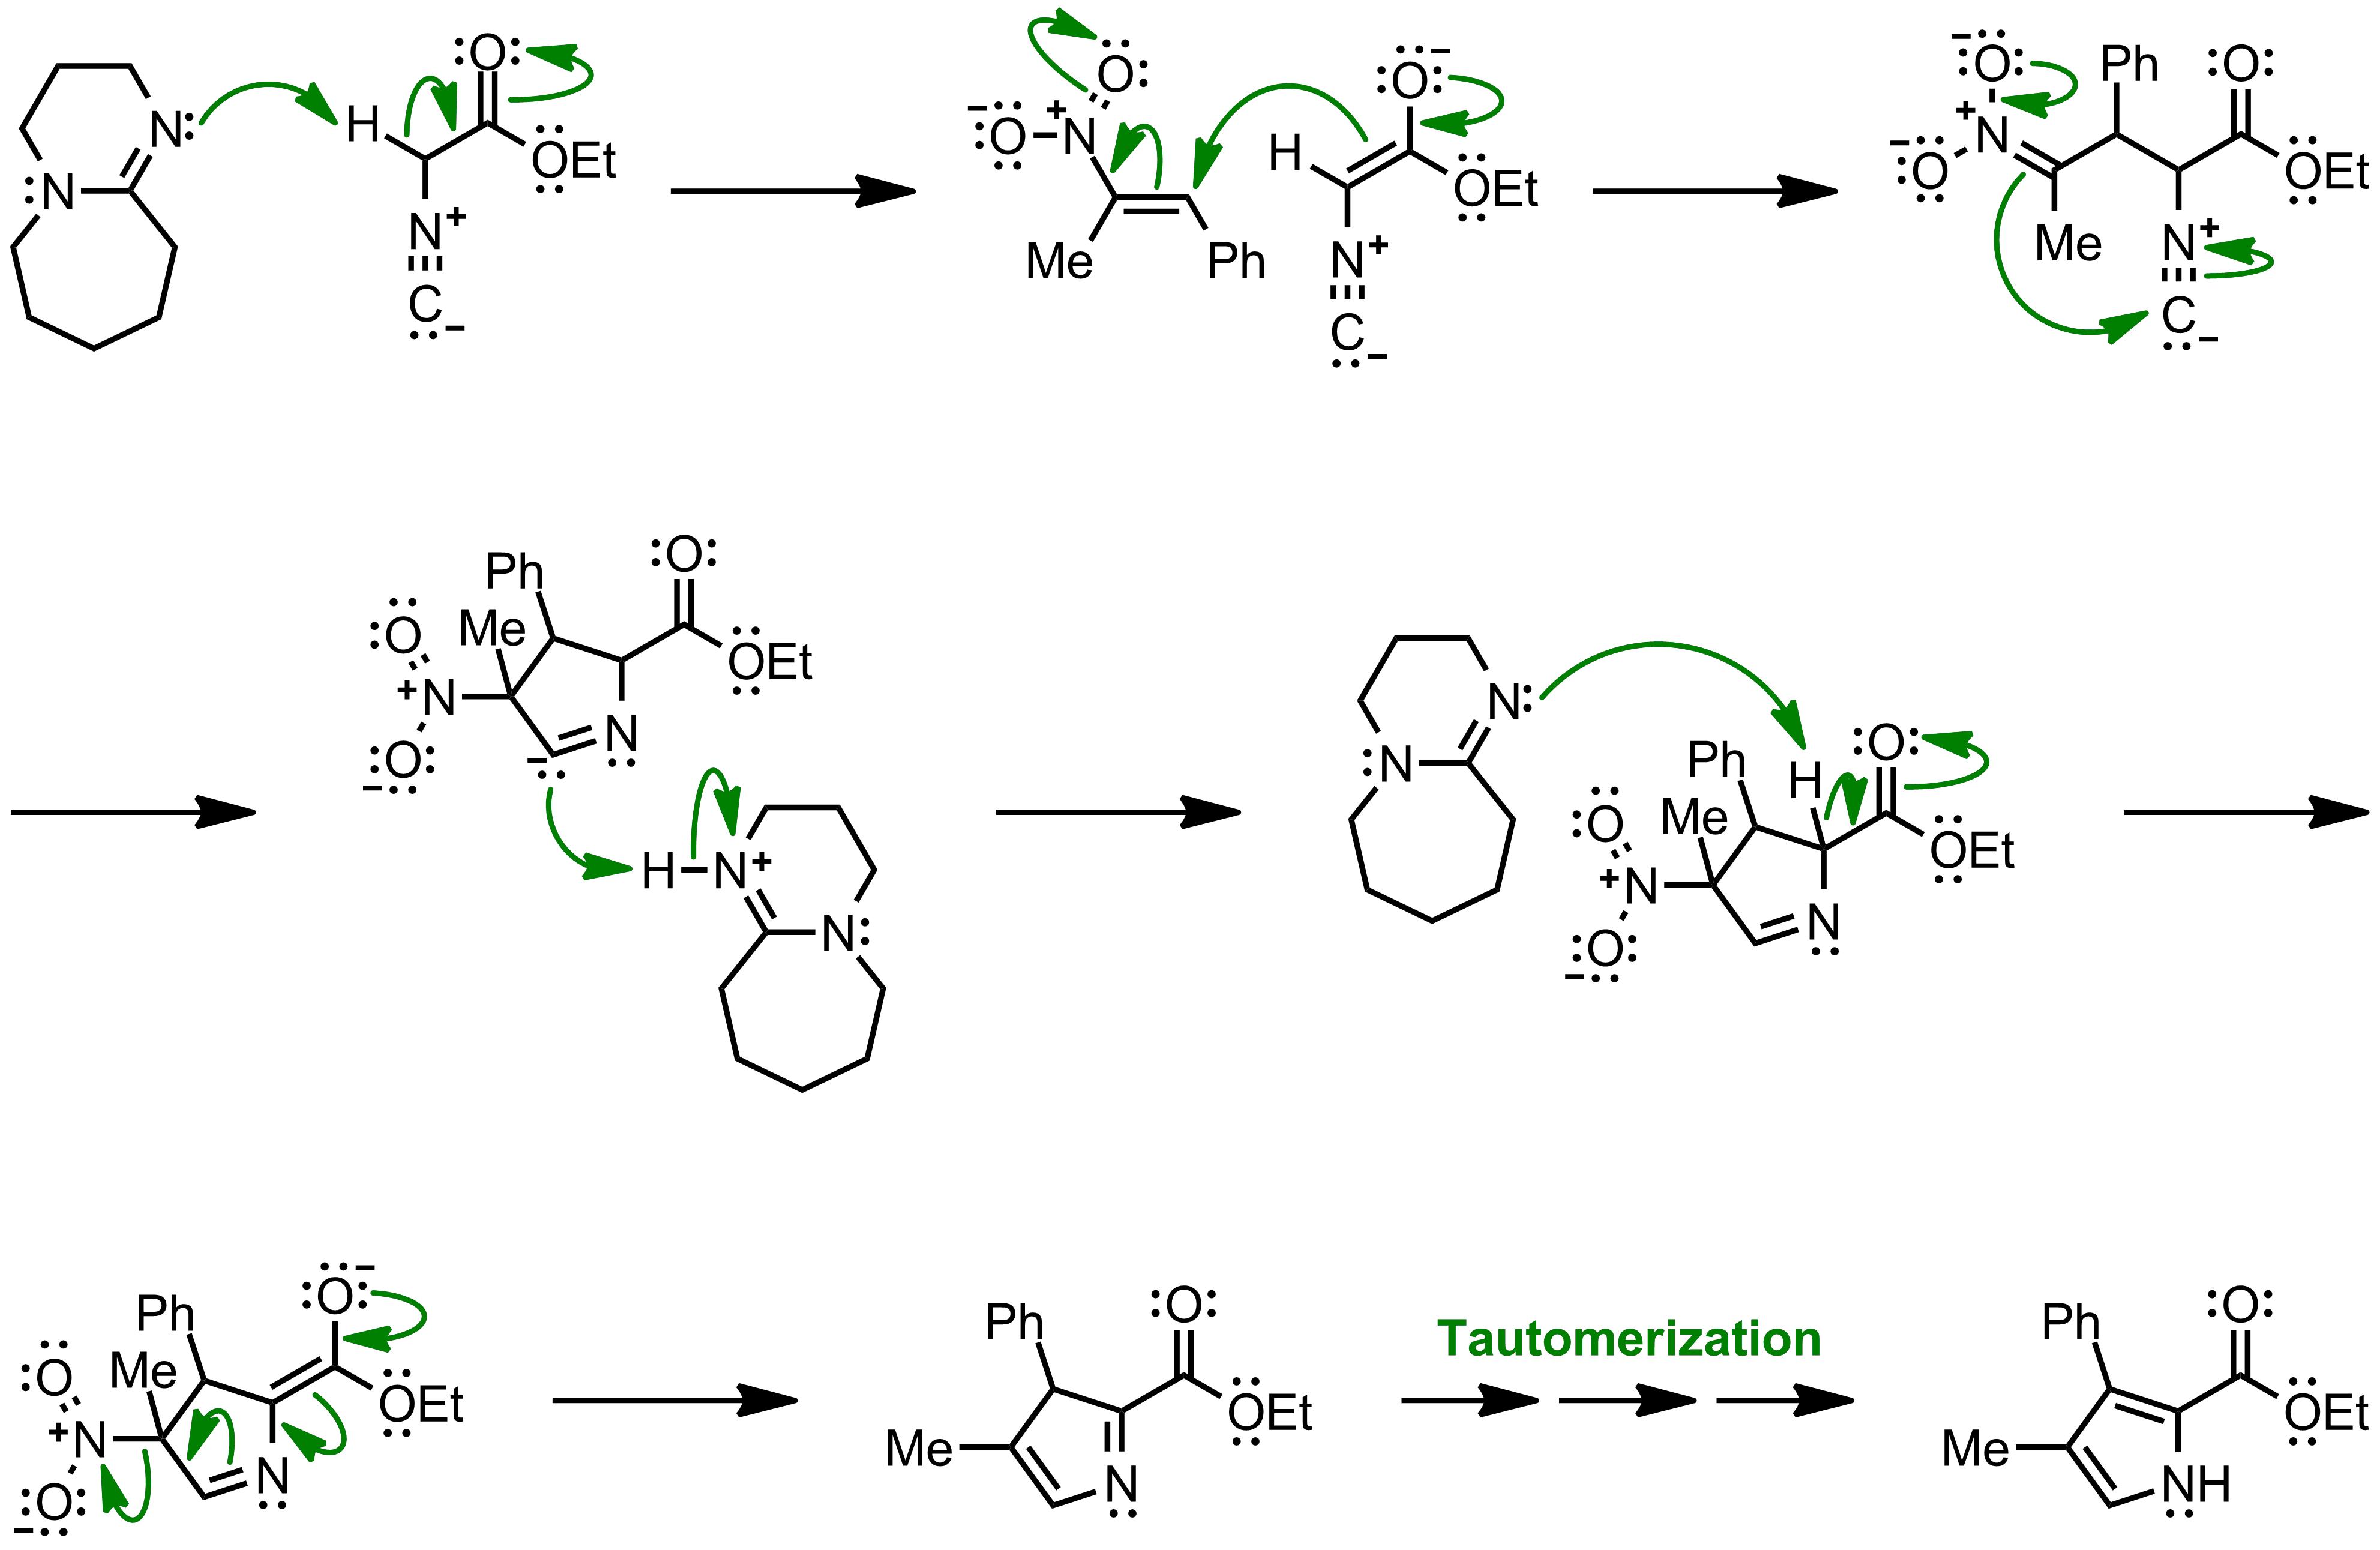 Mechanism of the Barton-Zard Reaction